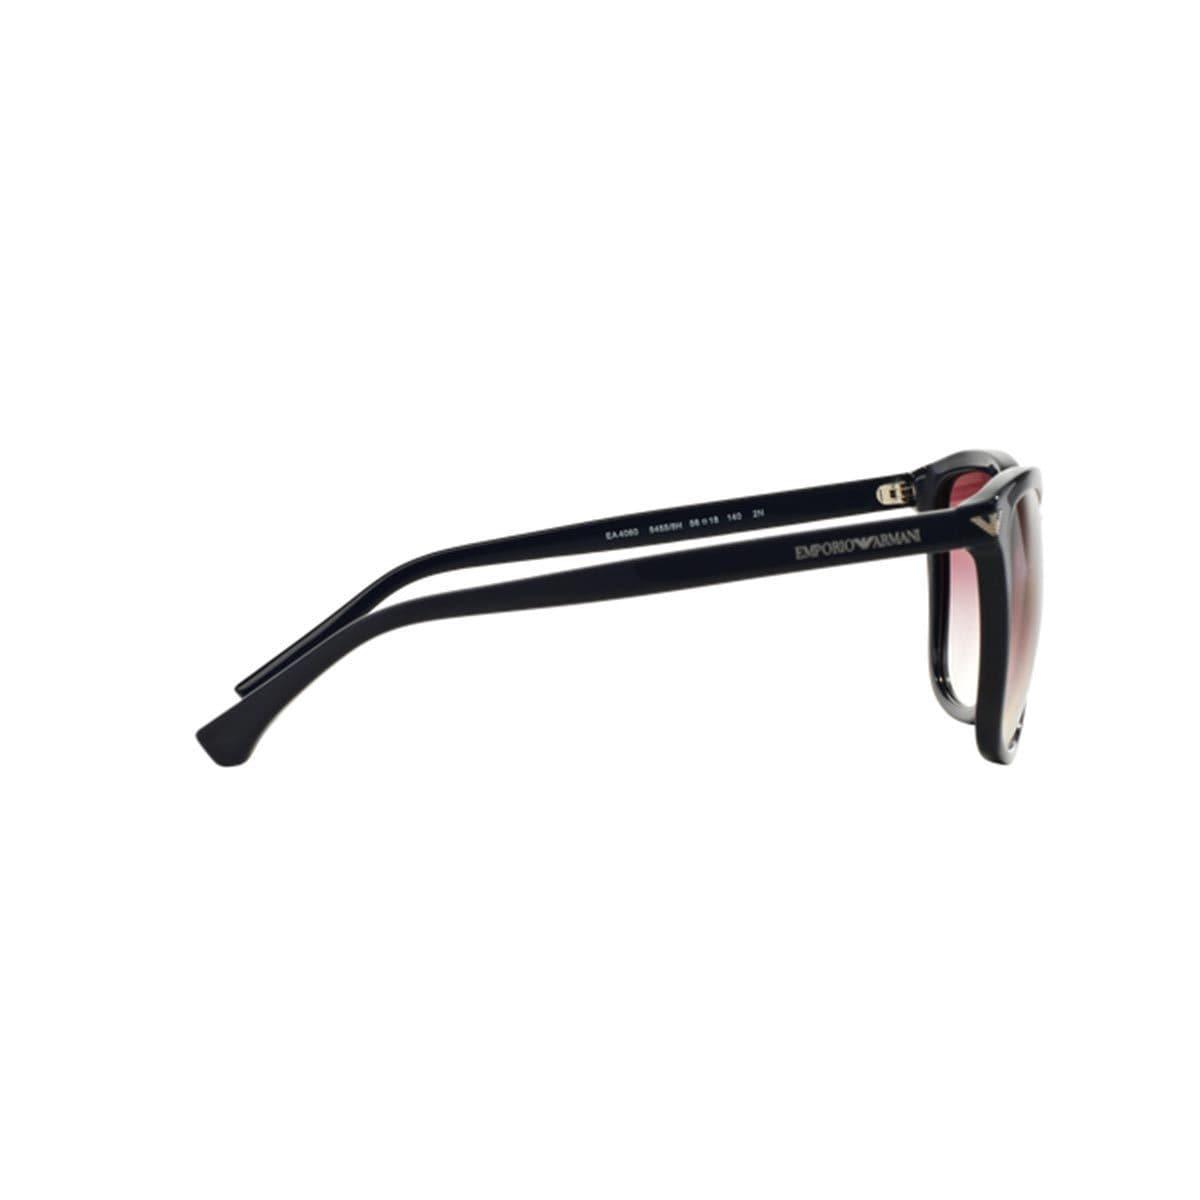 8ed8bc7d230d Shop Emporio Armani Women s EA4060 Blue Plastic Square Sunglasses - Free  Shipping Today - Overstock.com - 10857354